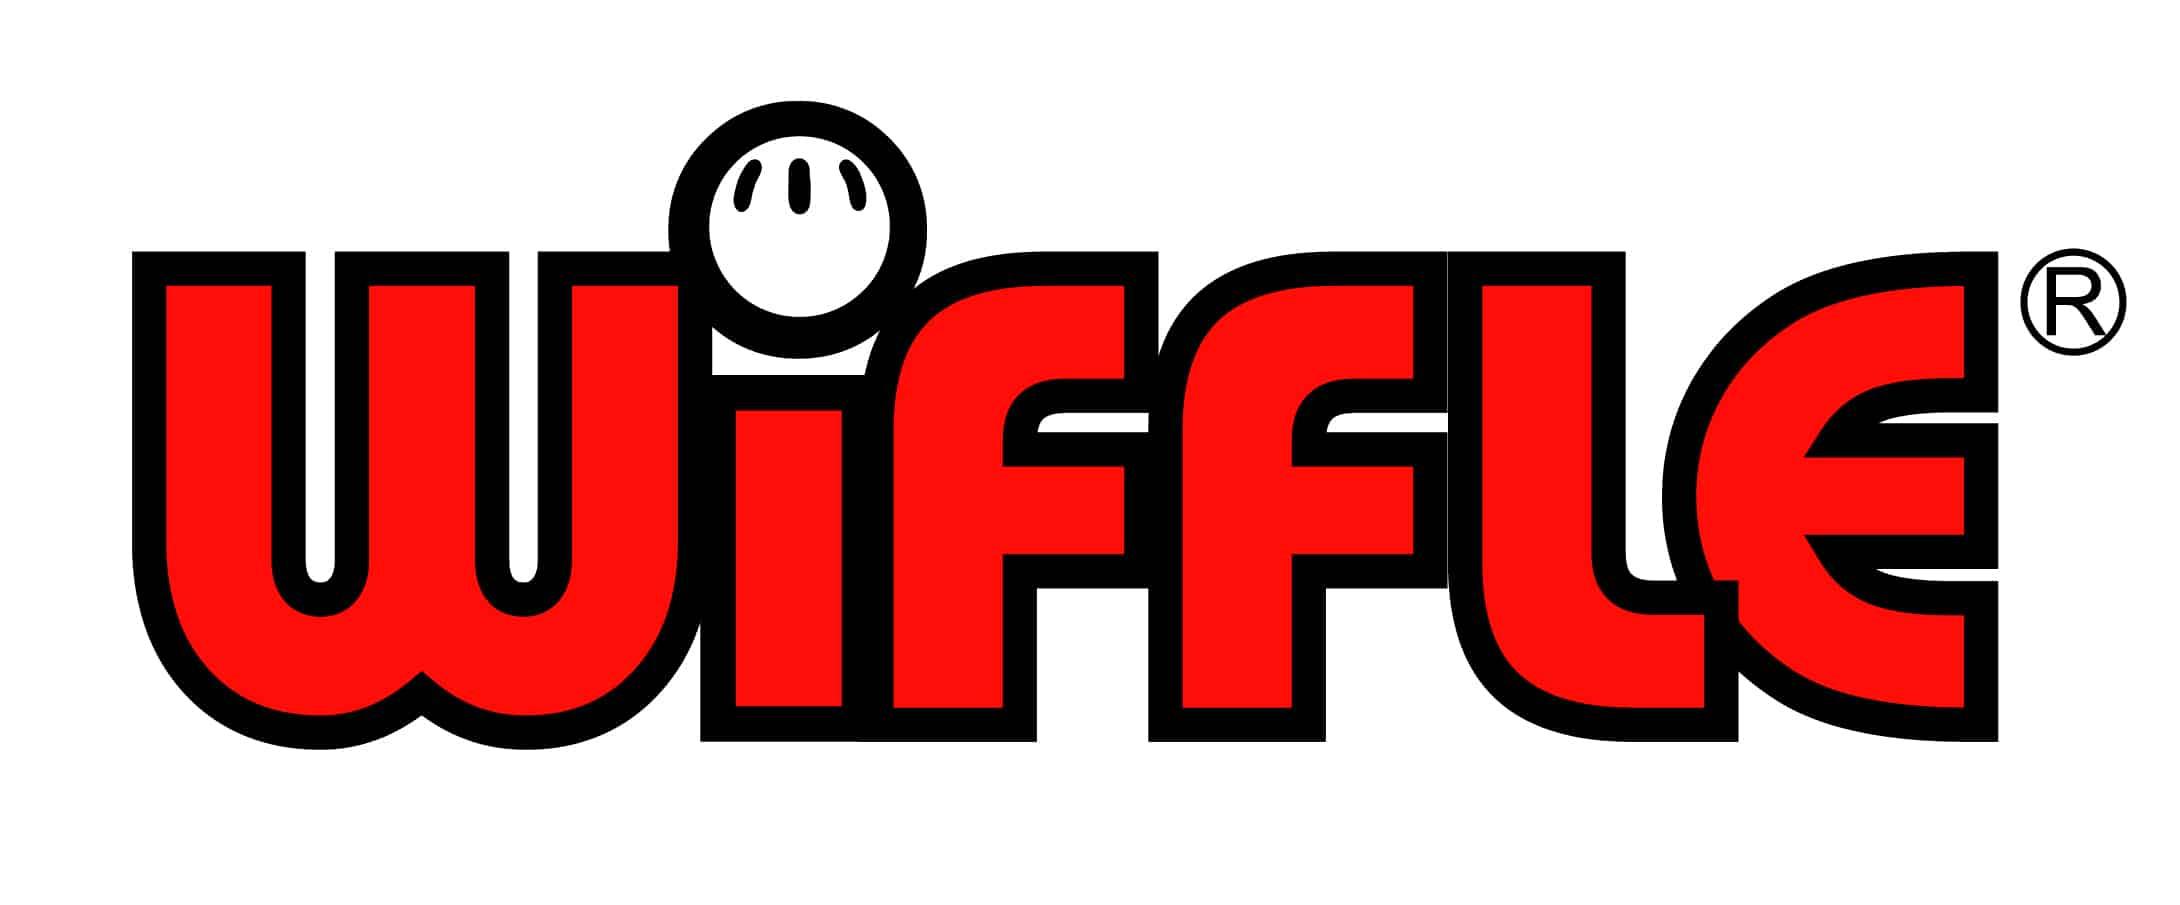 wiffle logo